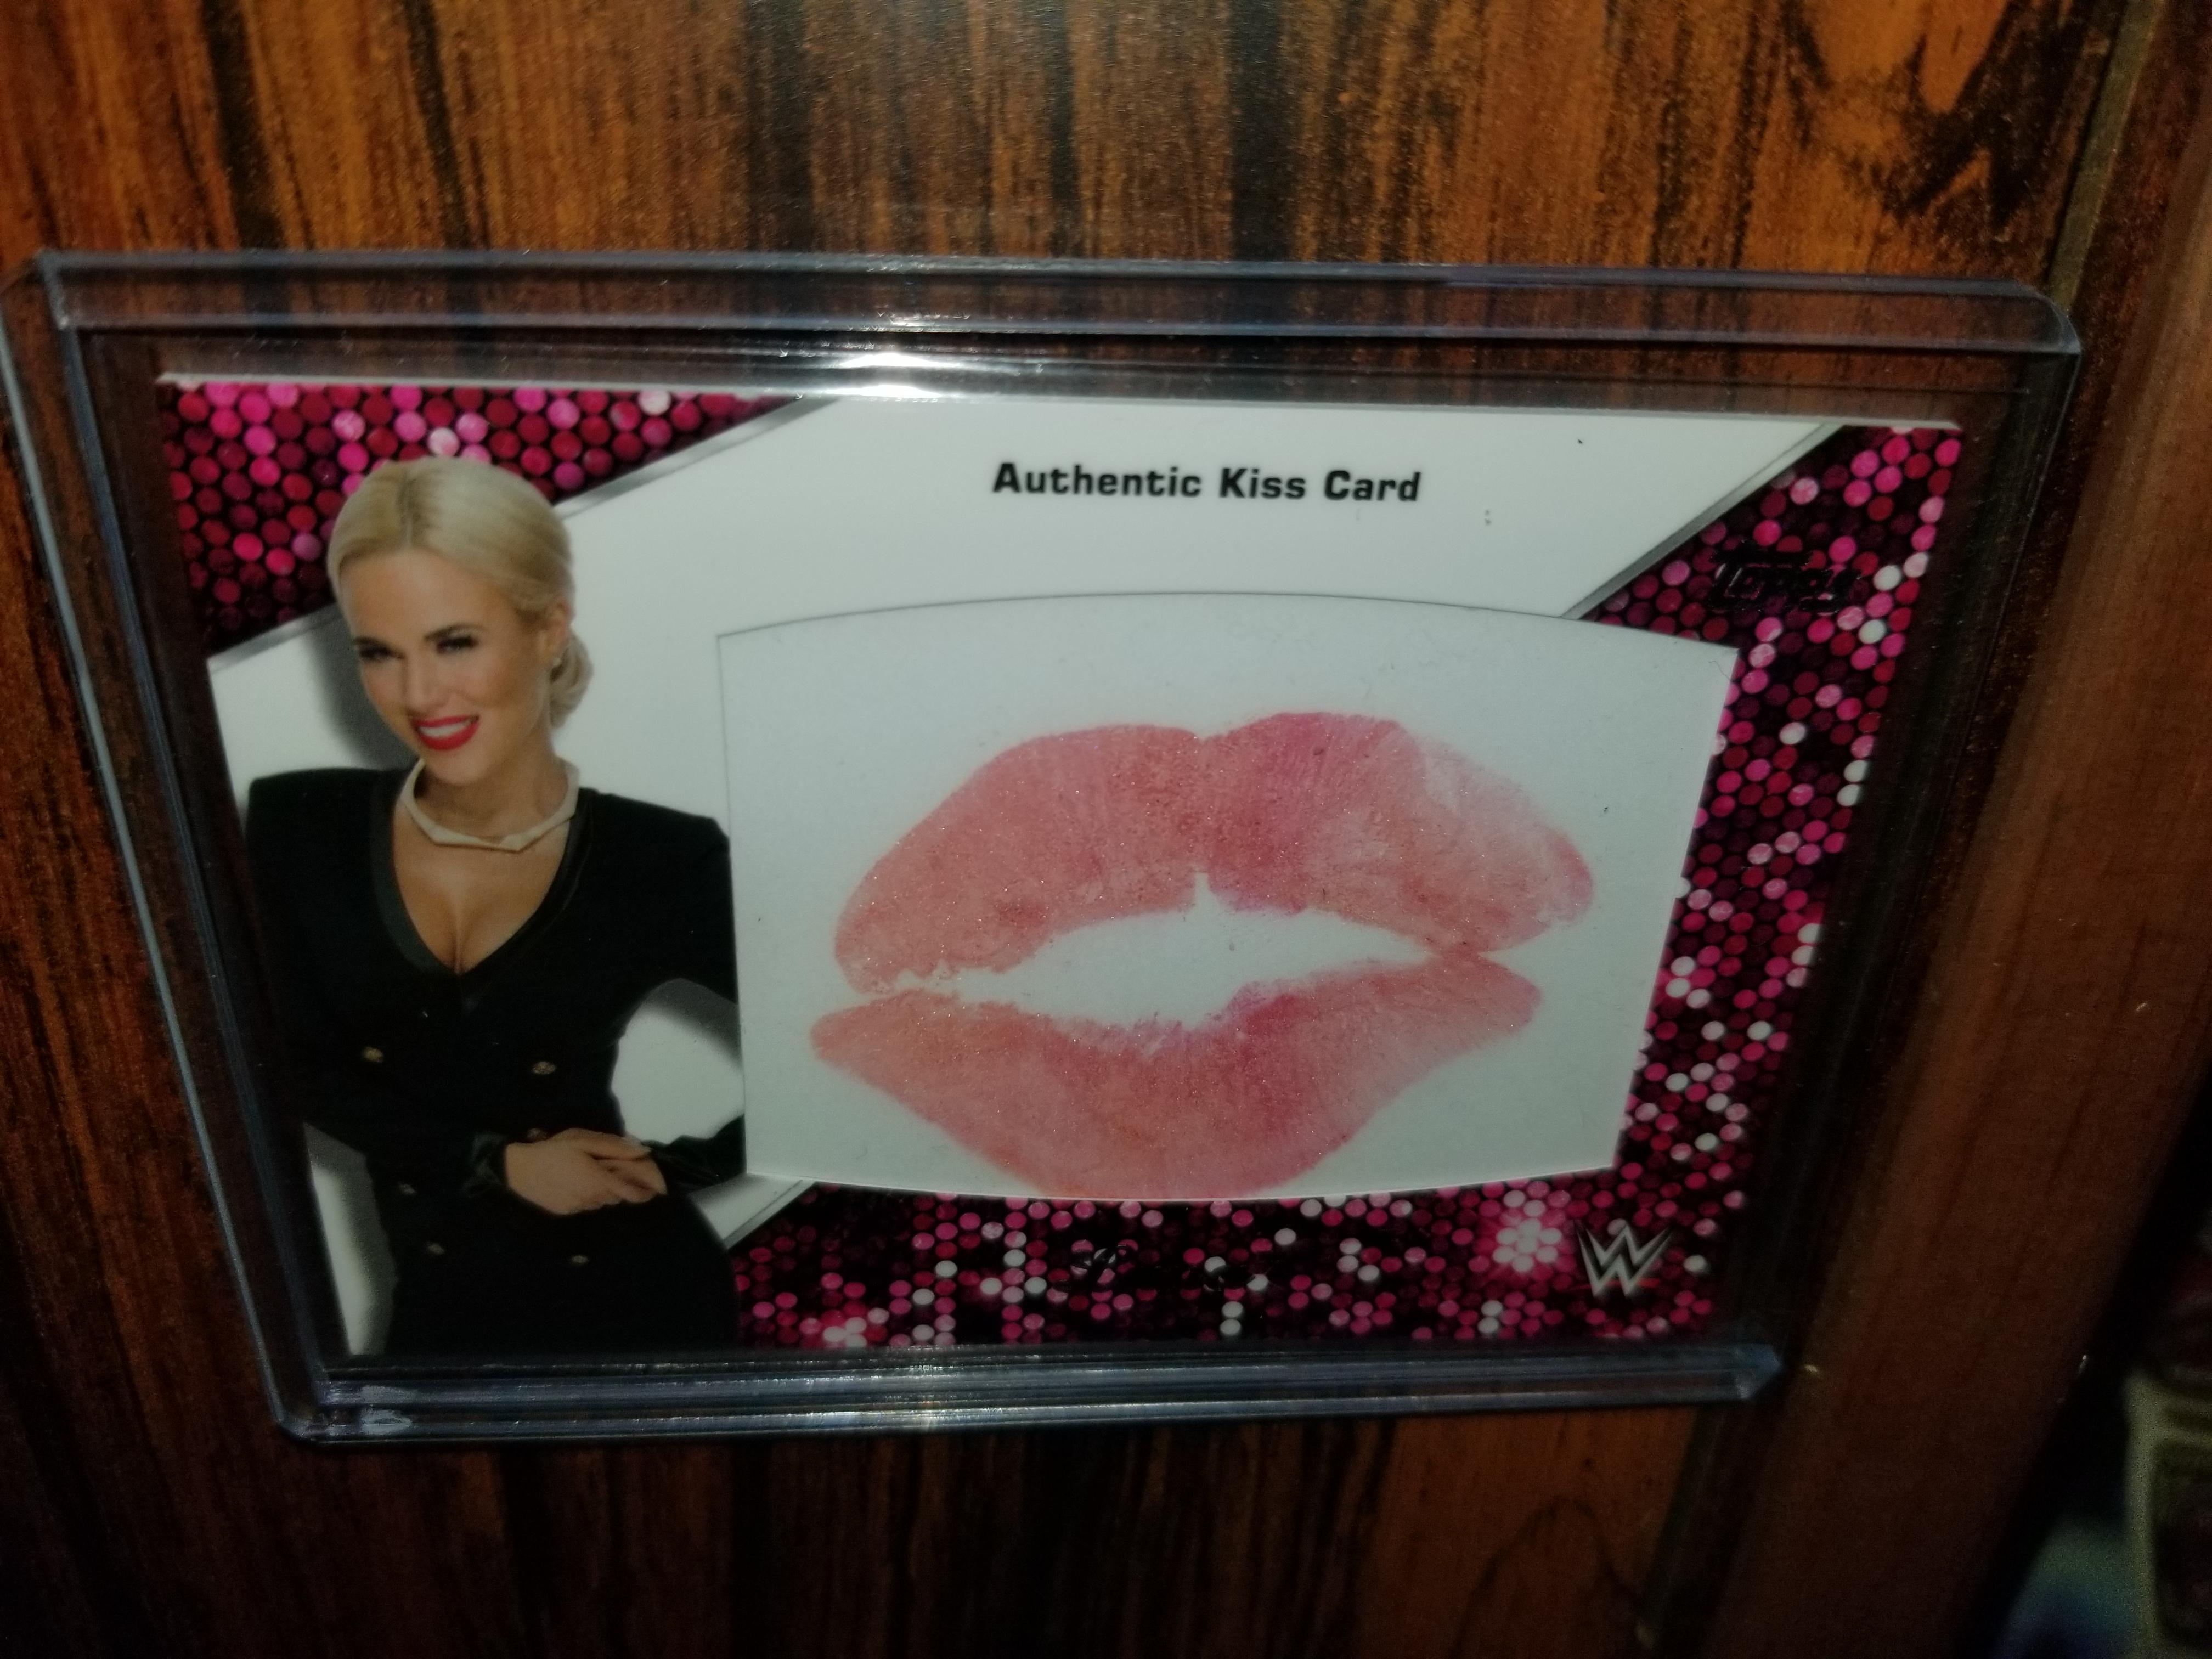 Lana Kiss Card